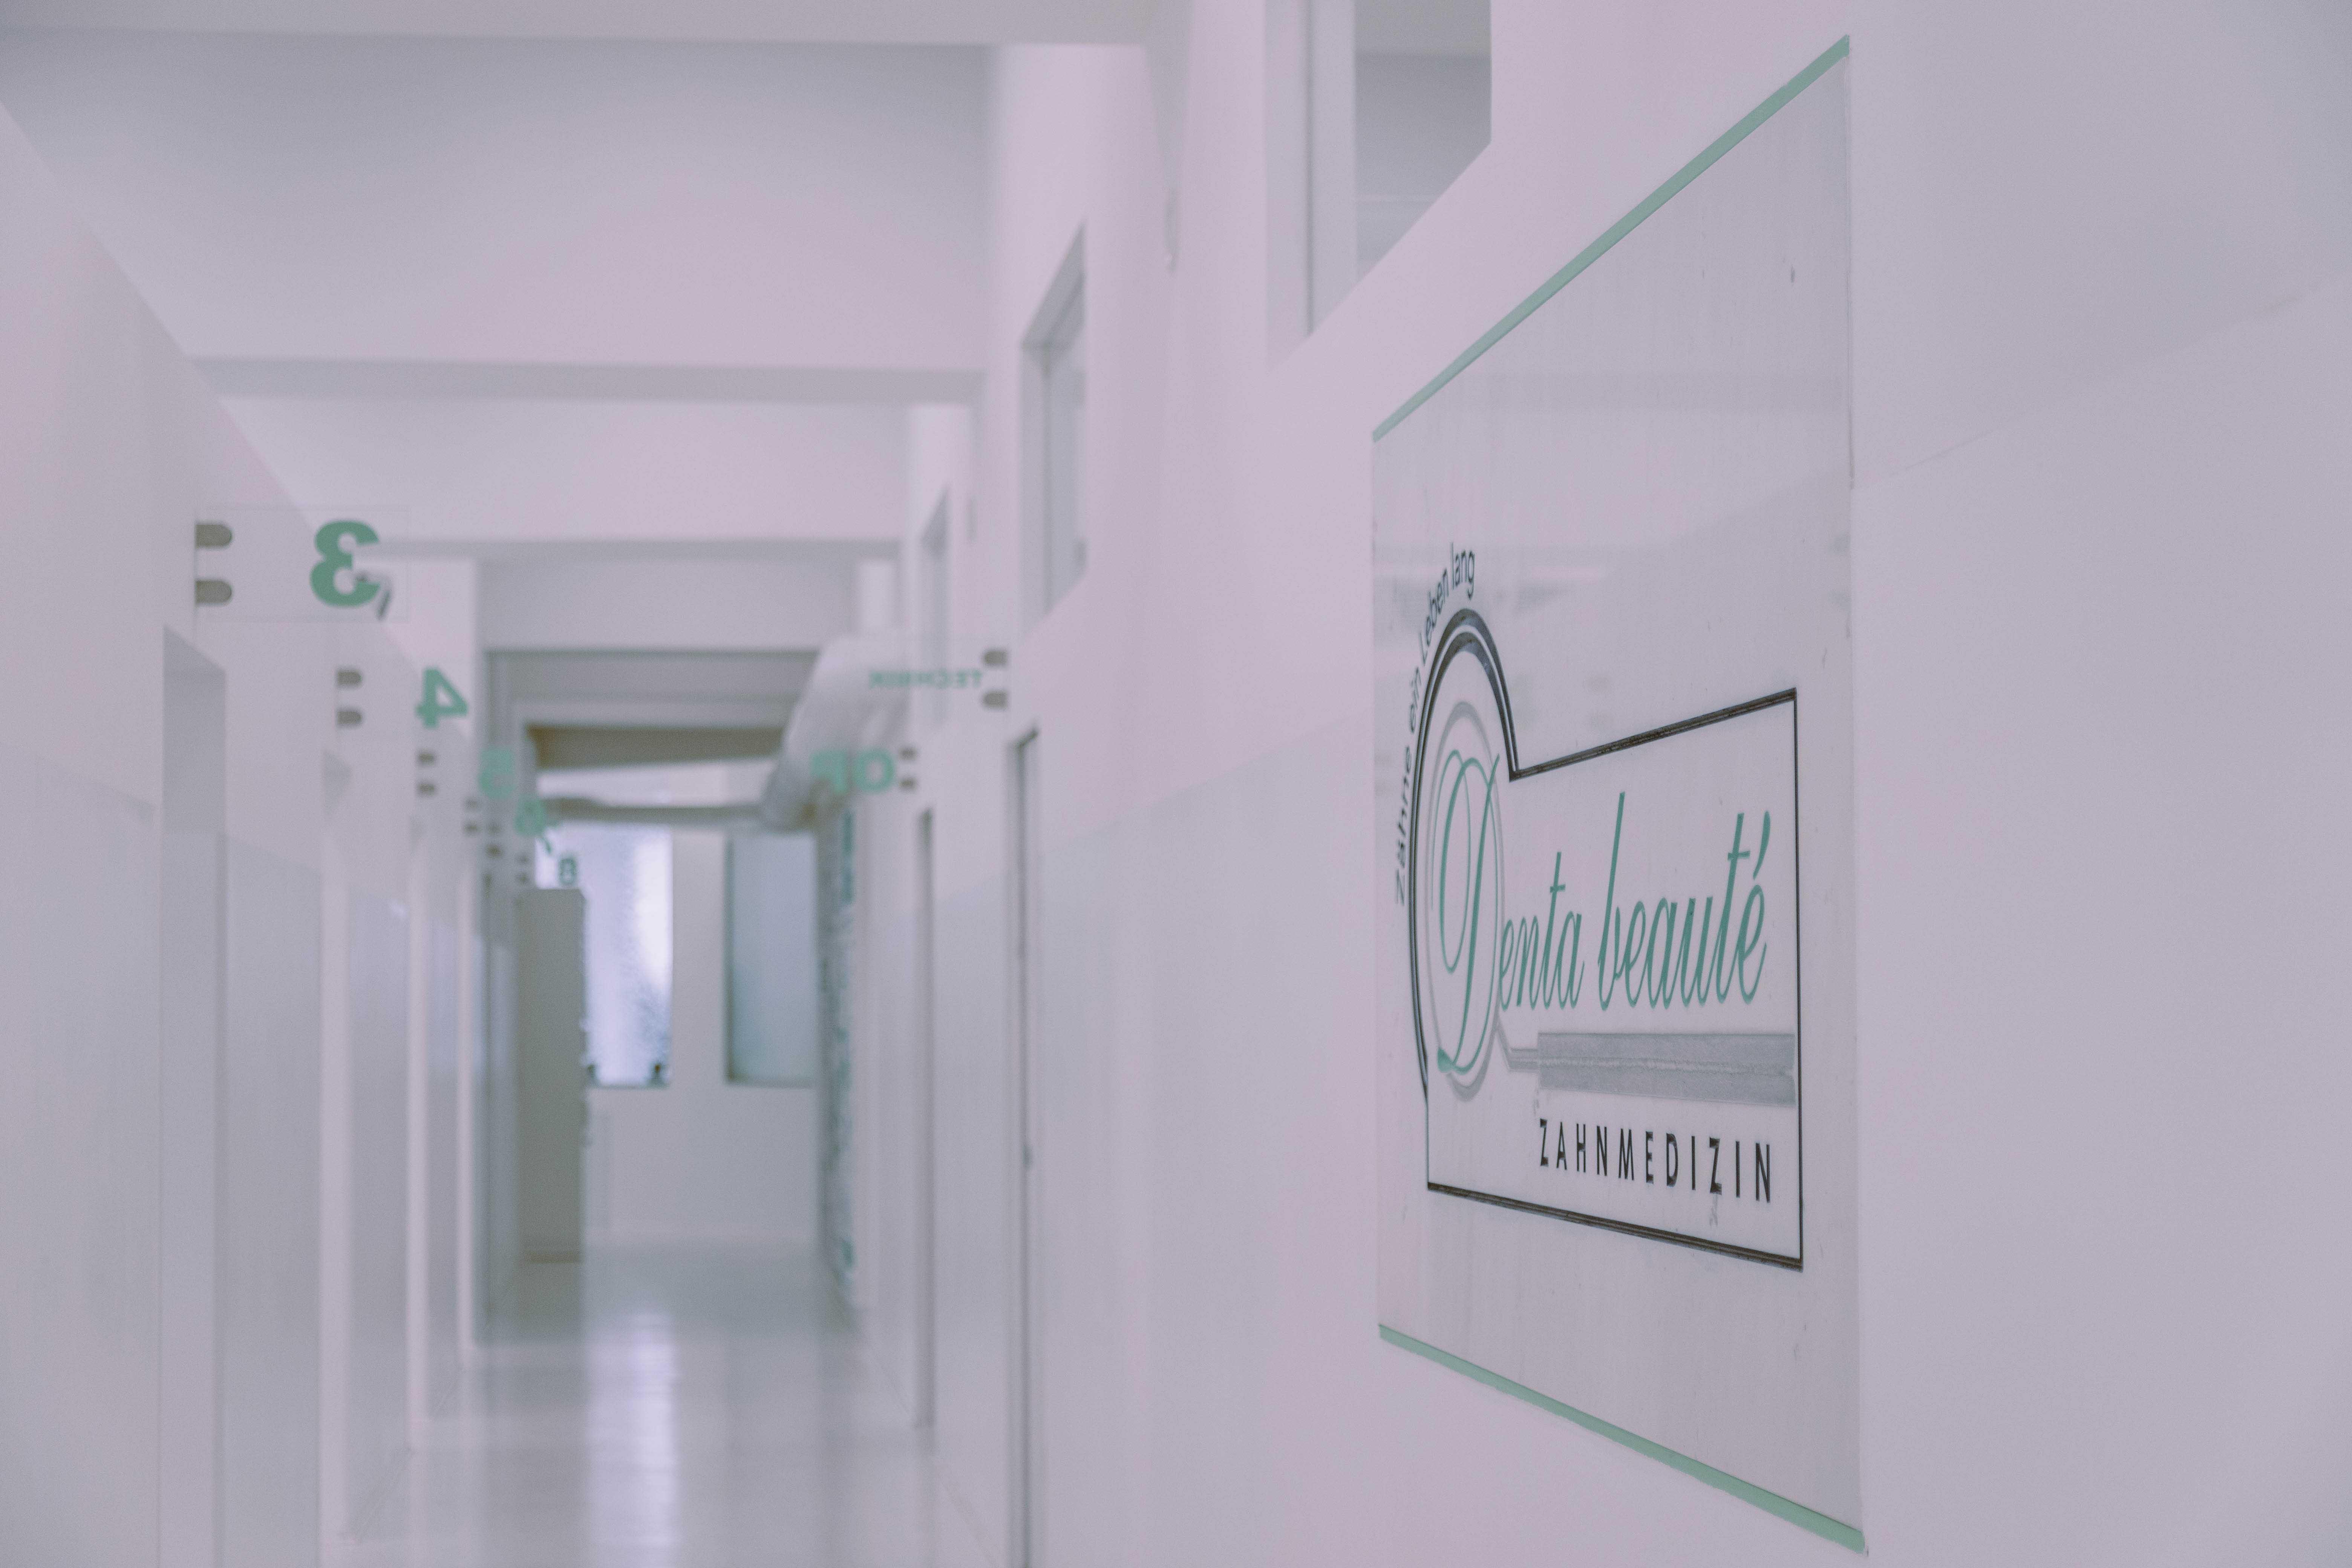 Stomatoloska ordinacija Denta Beaute